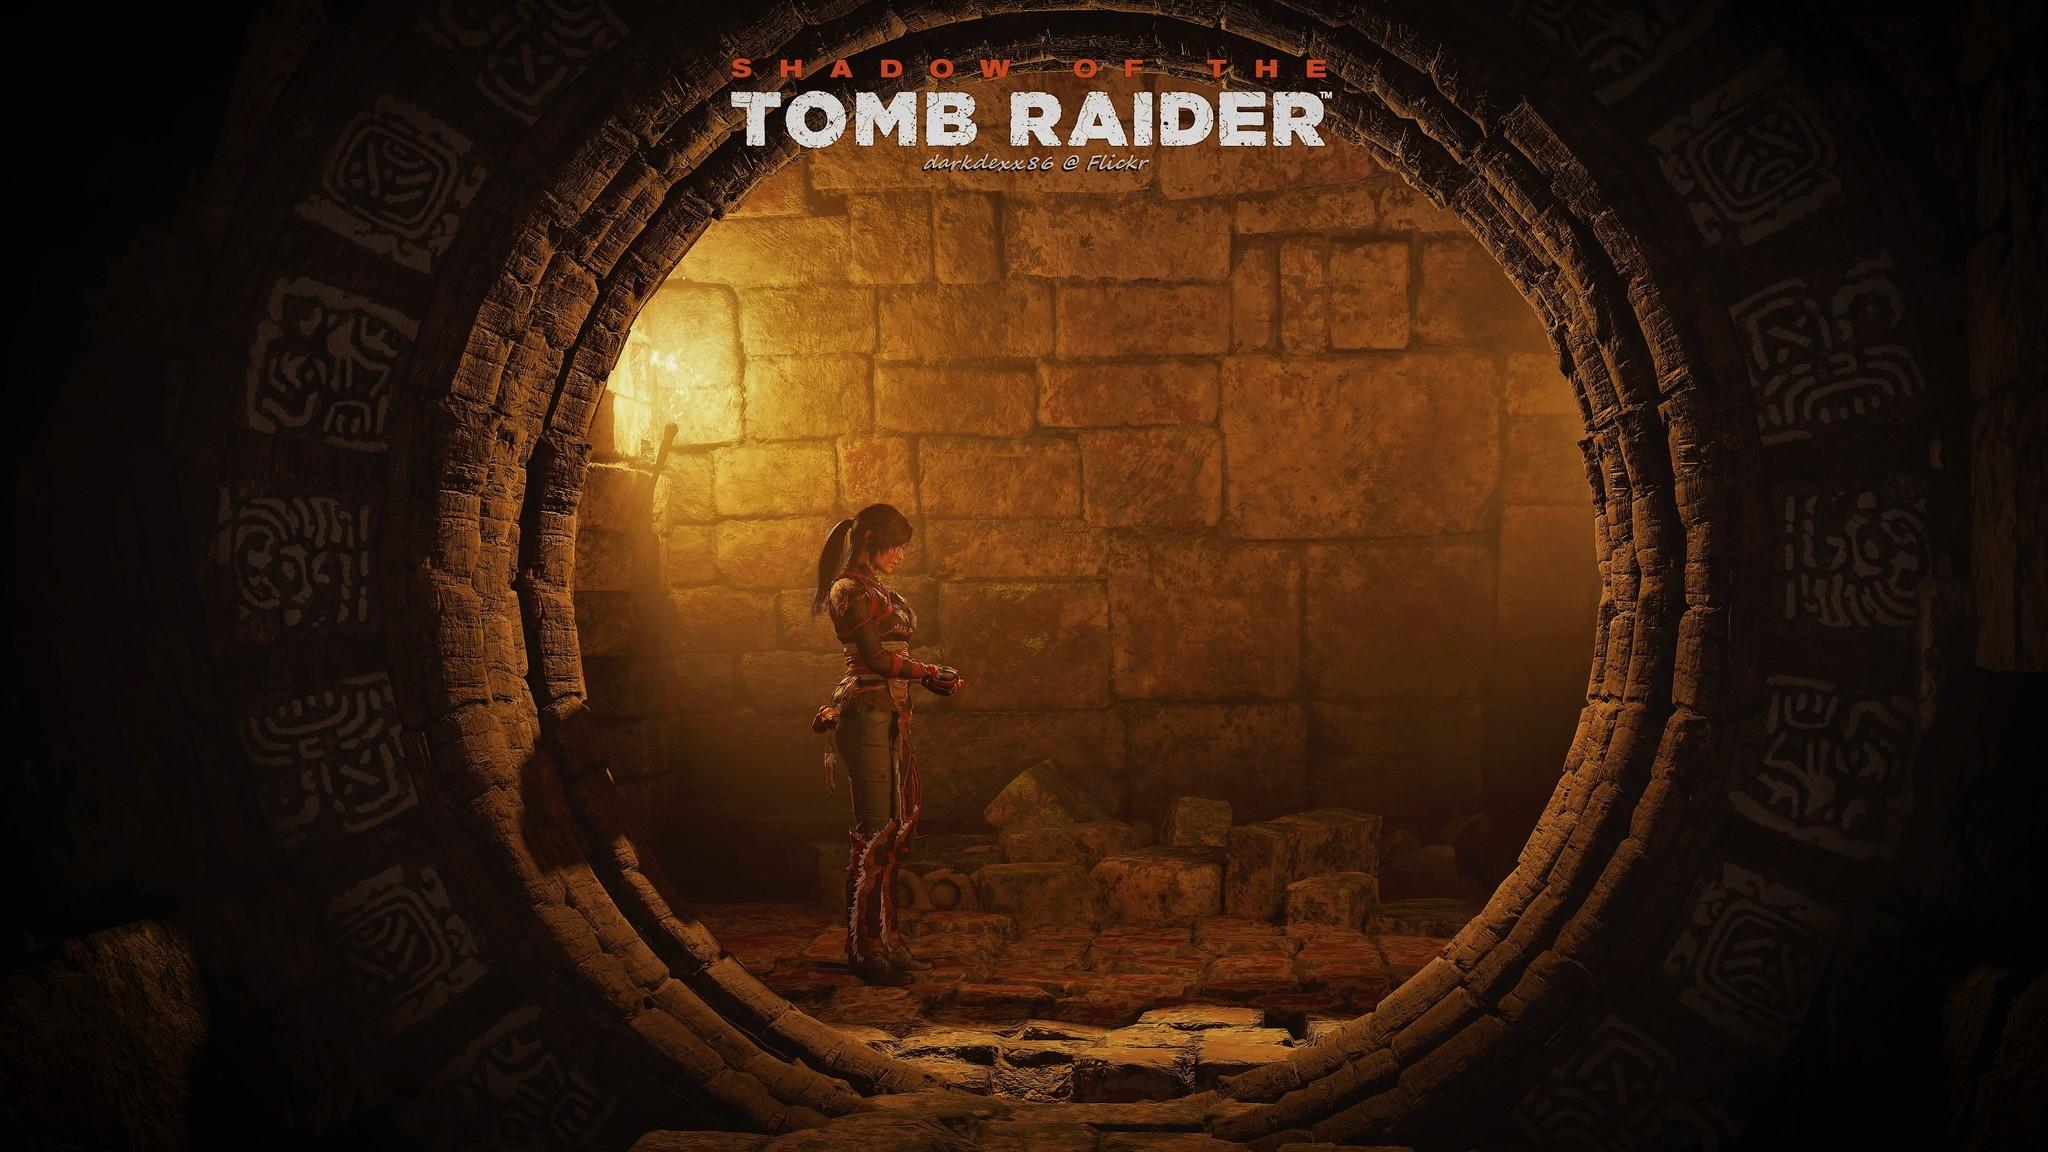 Lara Croft In Shadow Of The Tomb Raider Wallpaper Hd Games 4k